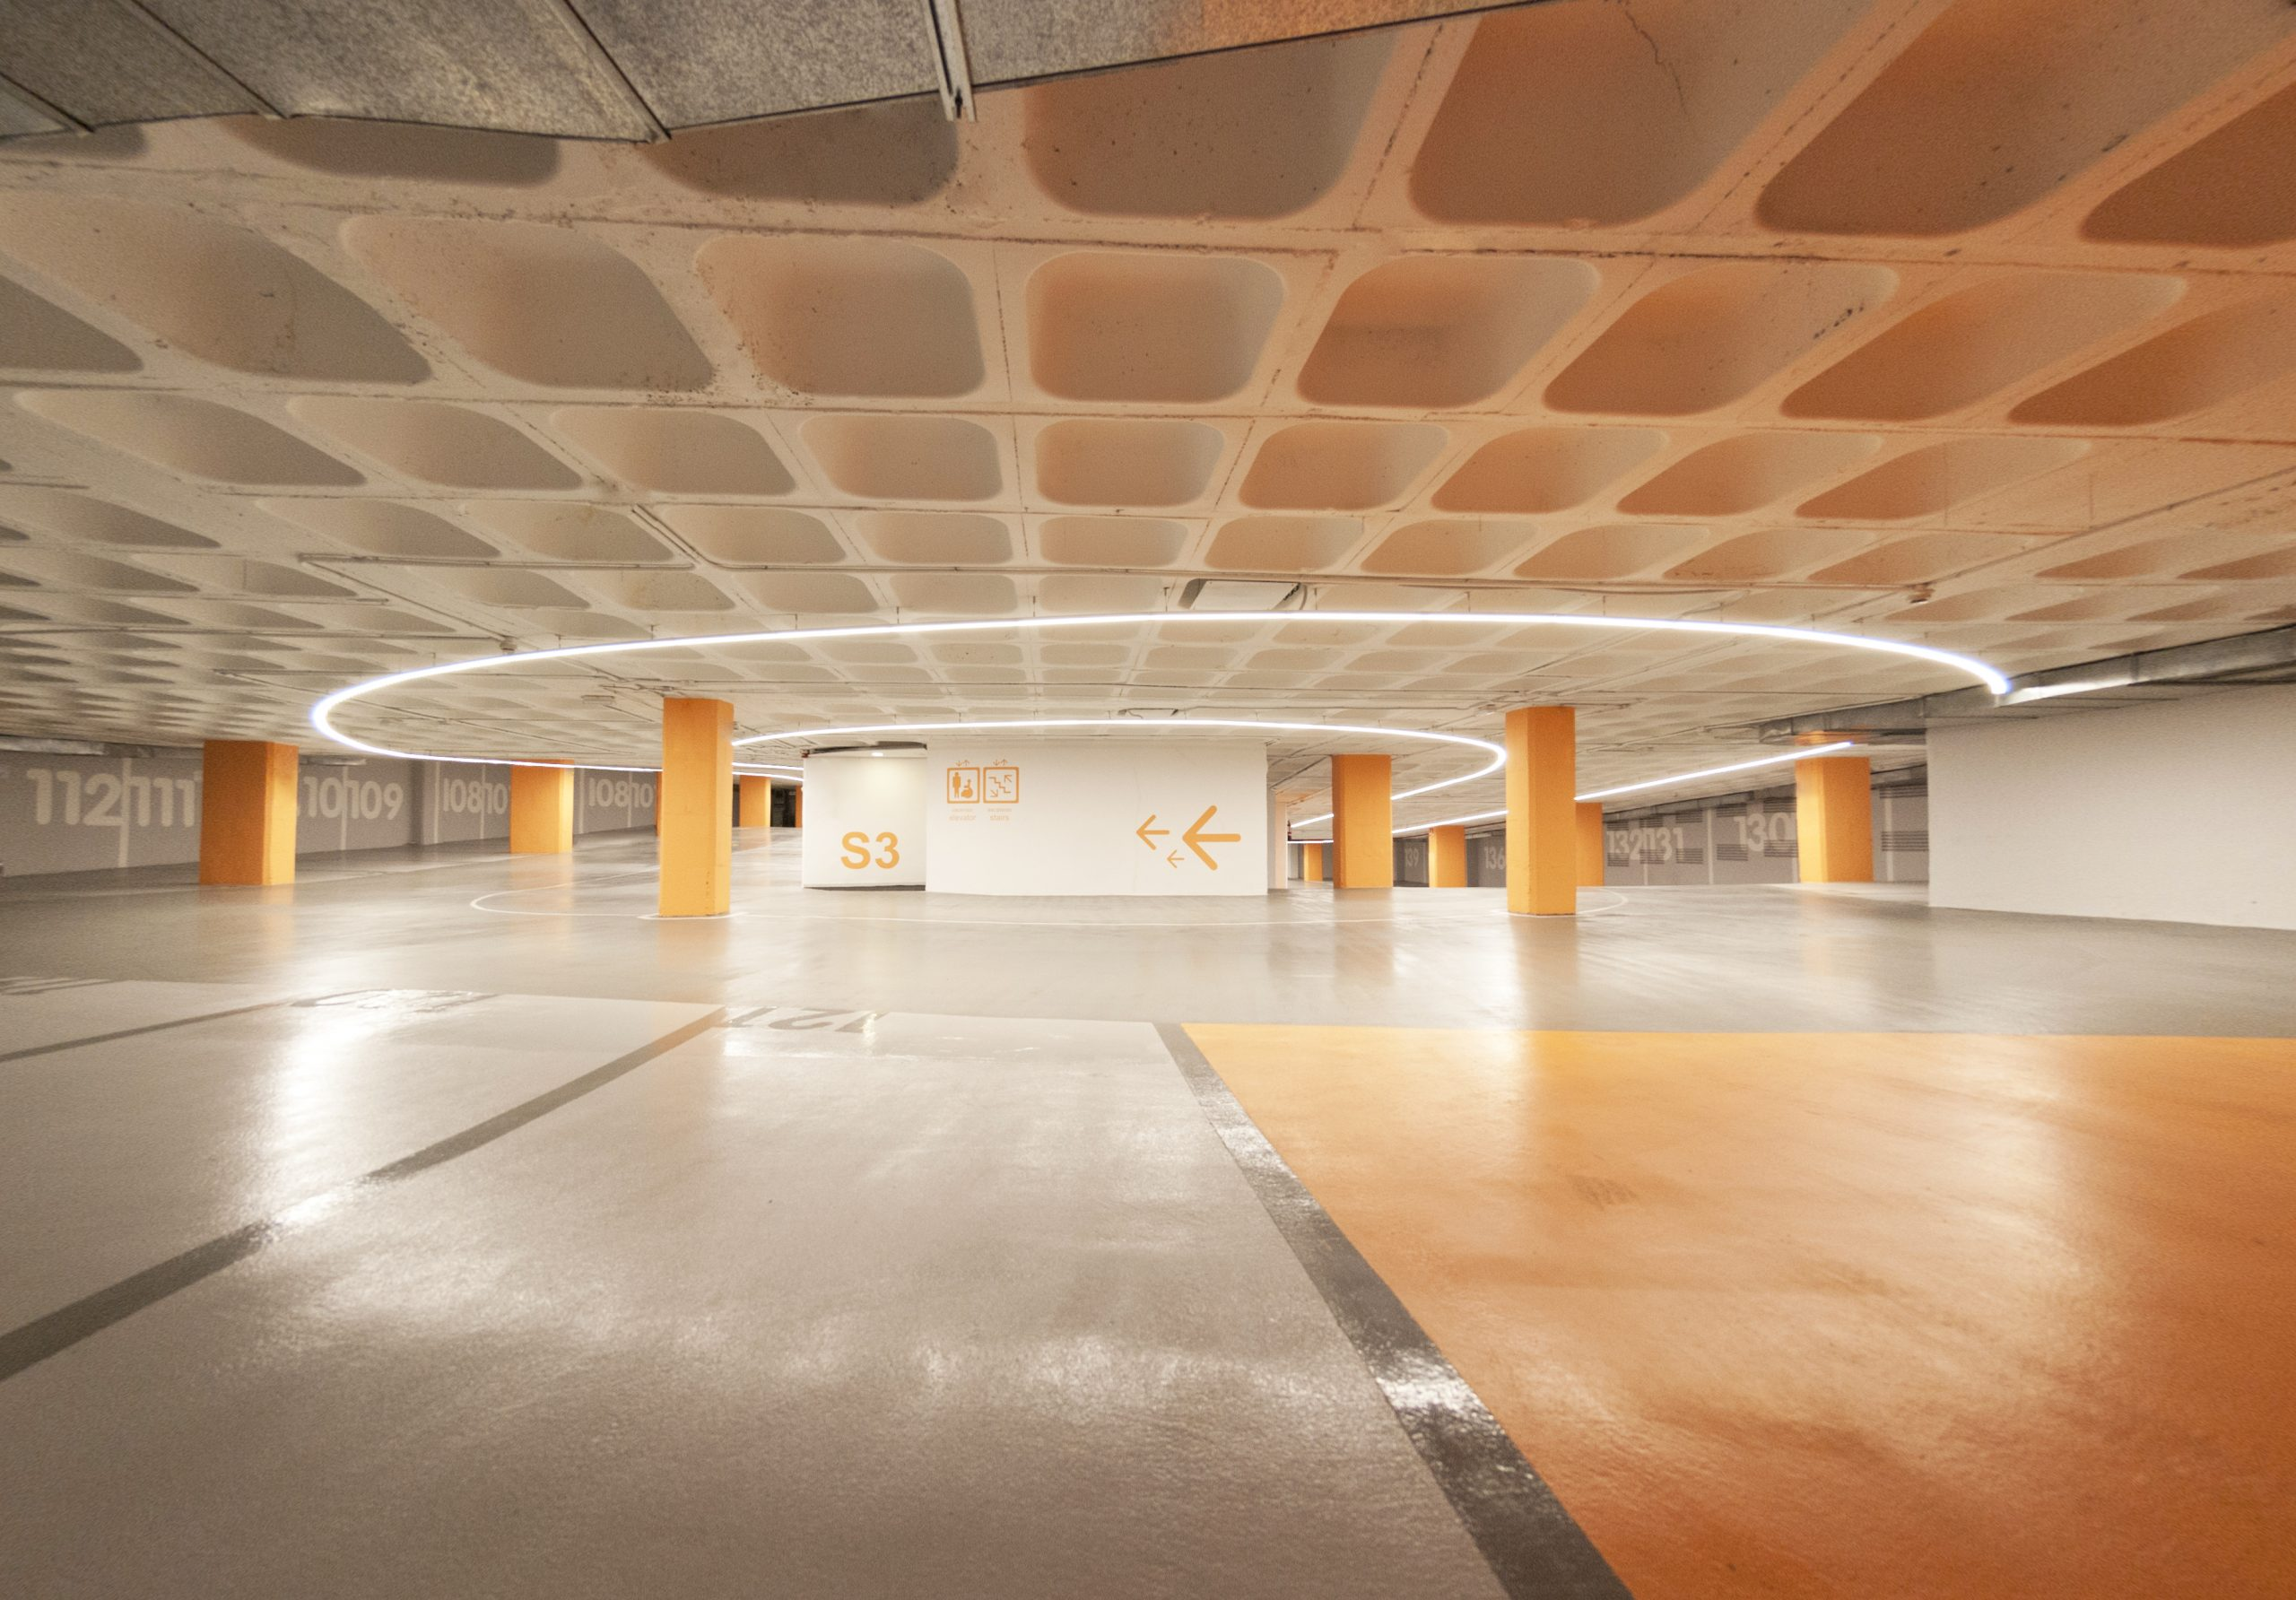 diseno_parking_arquitectura_corporativa_iluminacion_led_señaletica_noviembre_estudio